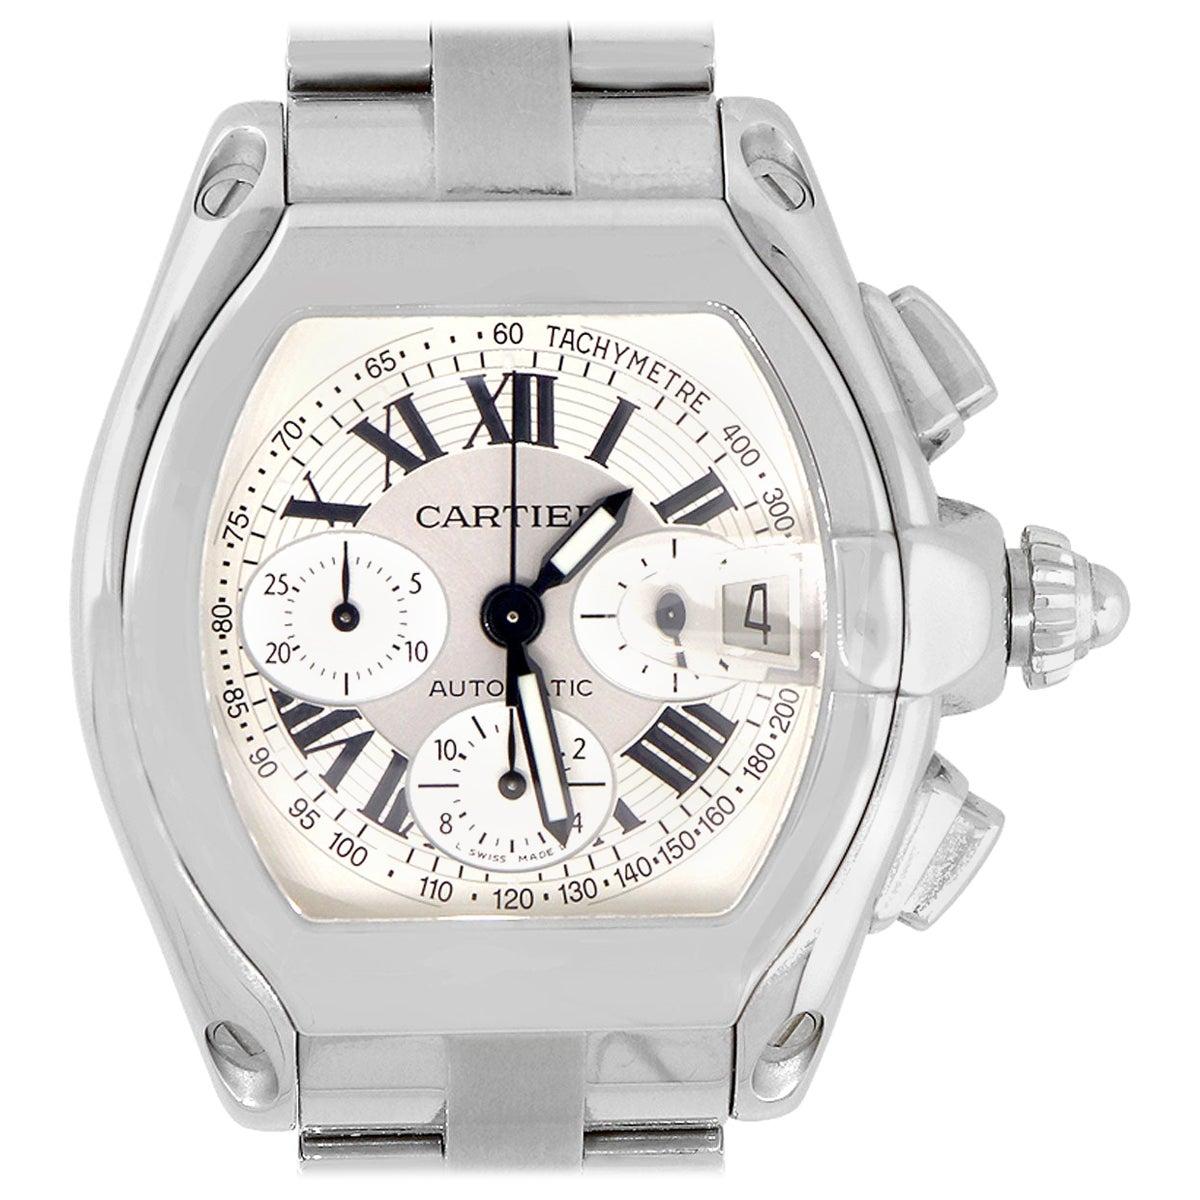 Cartier Roadster XL Silver Chronograph Dial Watch